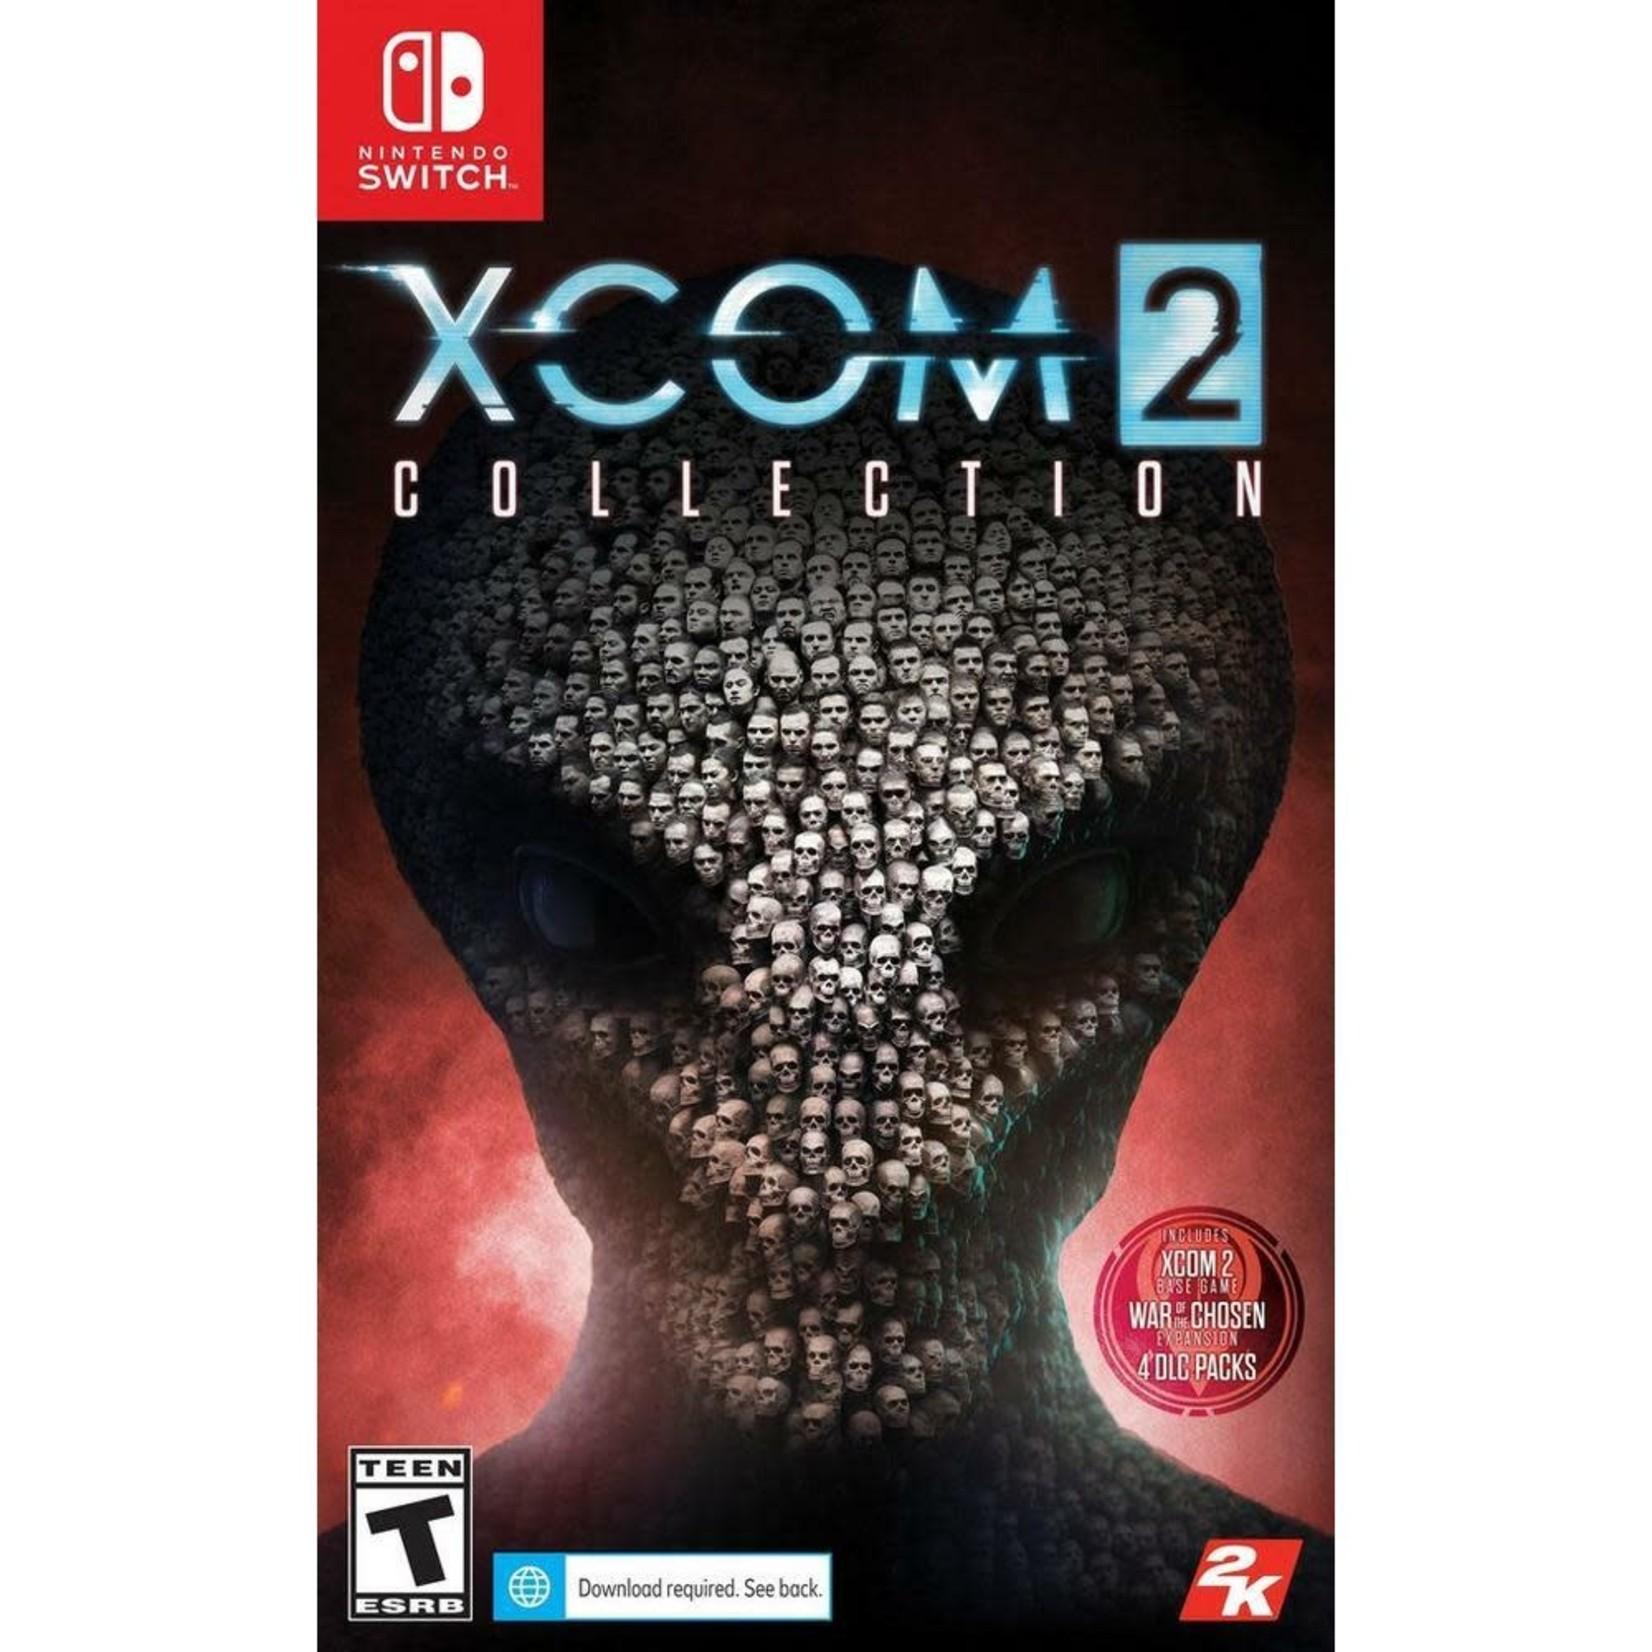 SWITCHU-XCOM 2 Collection